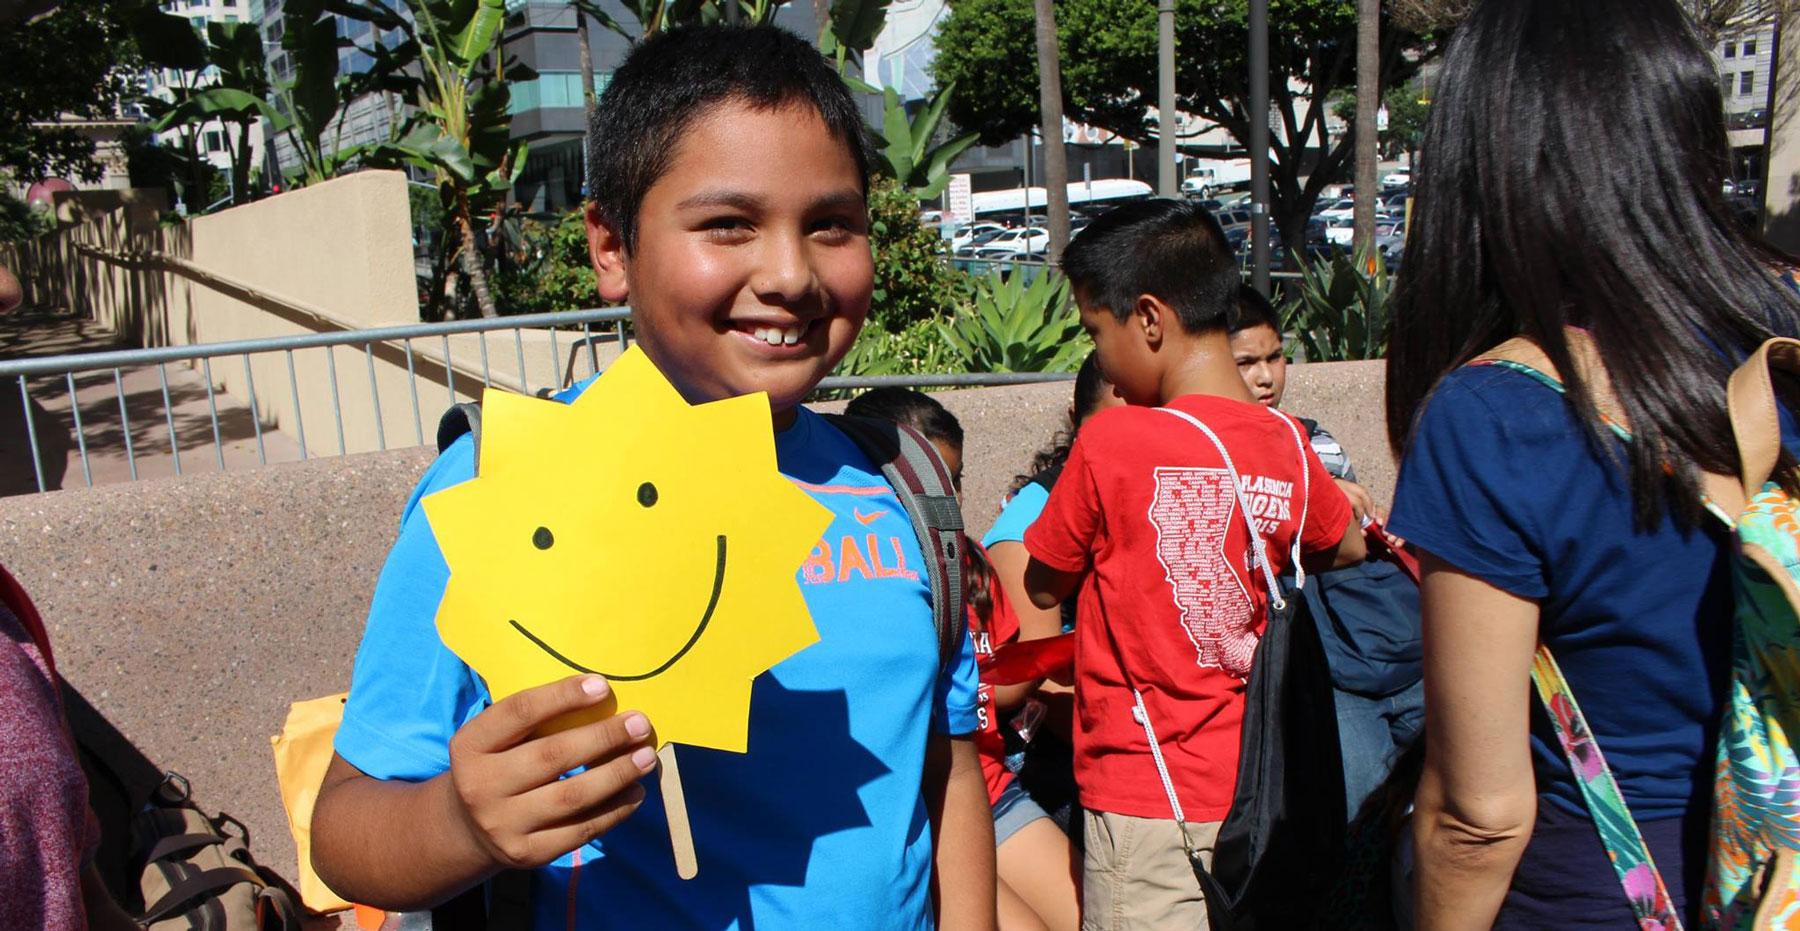 Florida solar schools student with sunshine